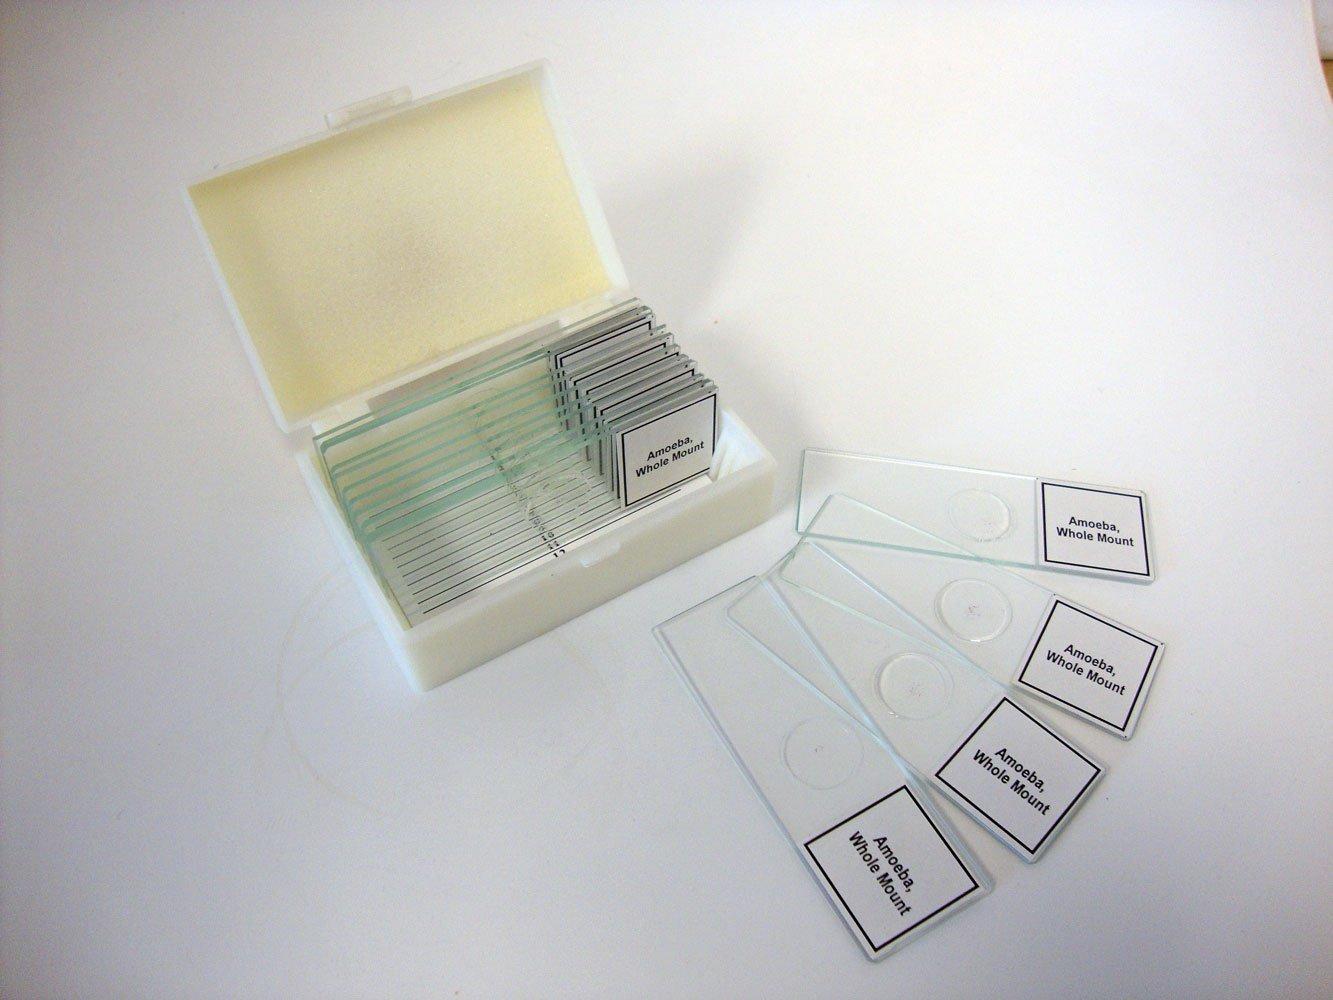 Prepared Slide, Amoeba proteus, Classpack of 15 Sides (Free USPS Shipping)